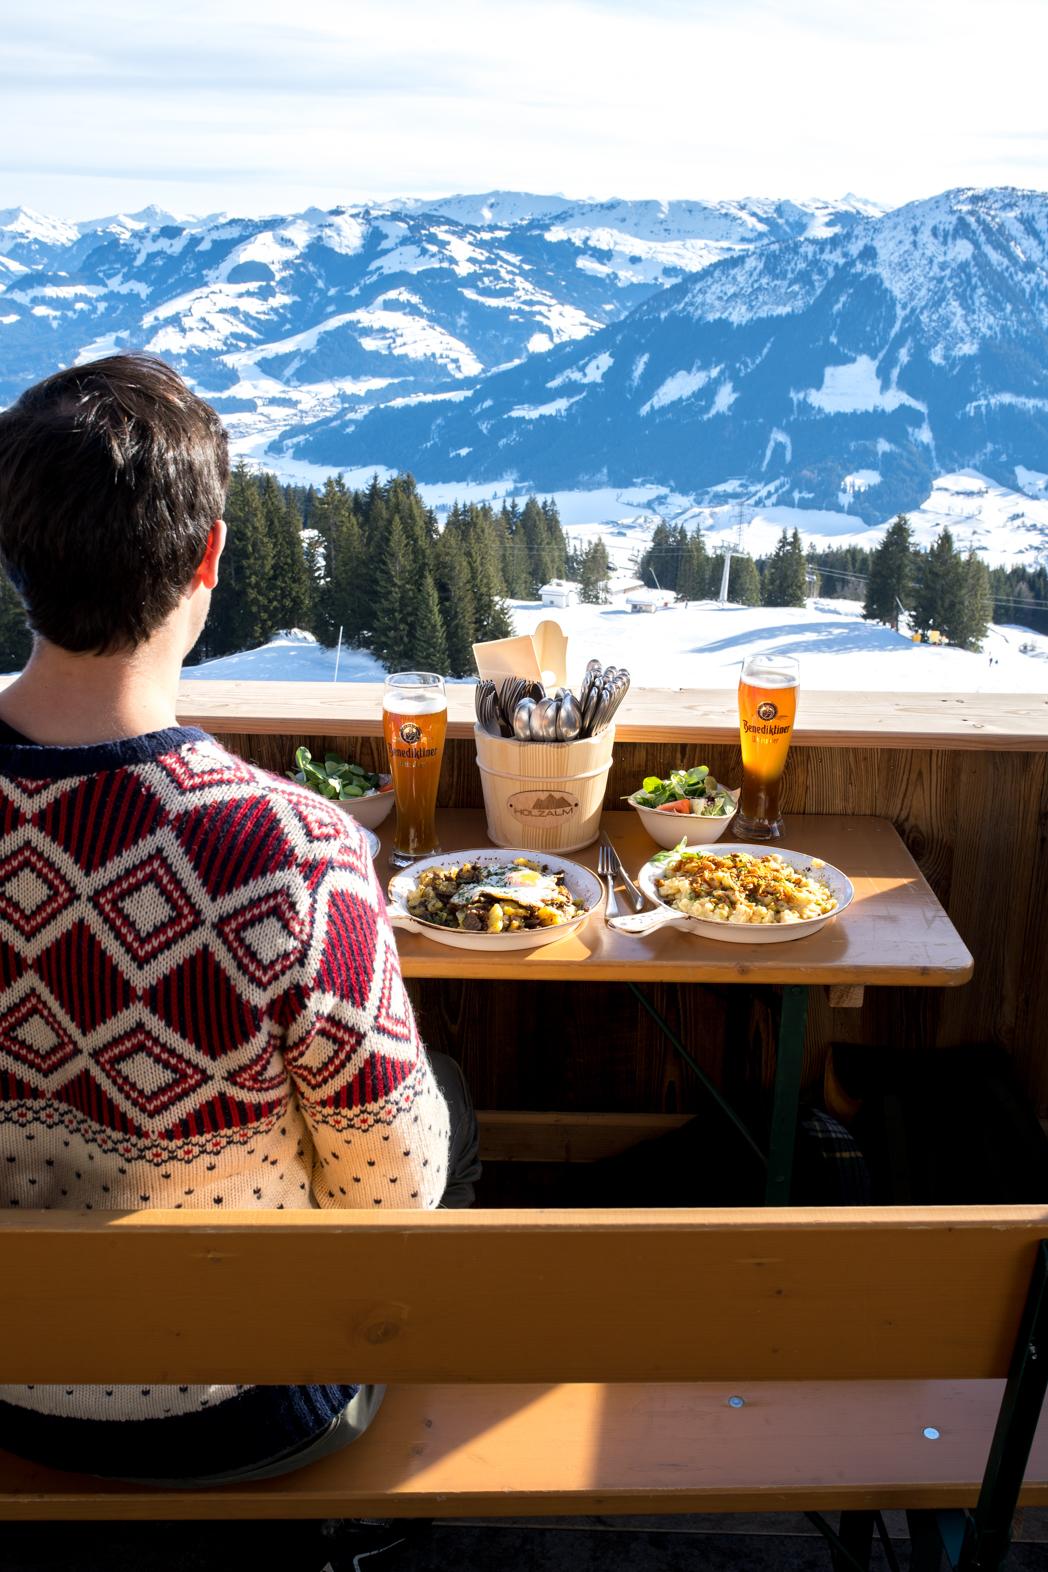 Stacie Flinner Christmas Ski Kitzbuhel Austria -29.jpg